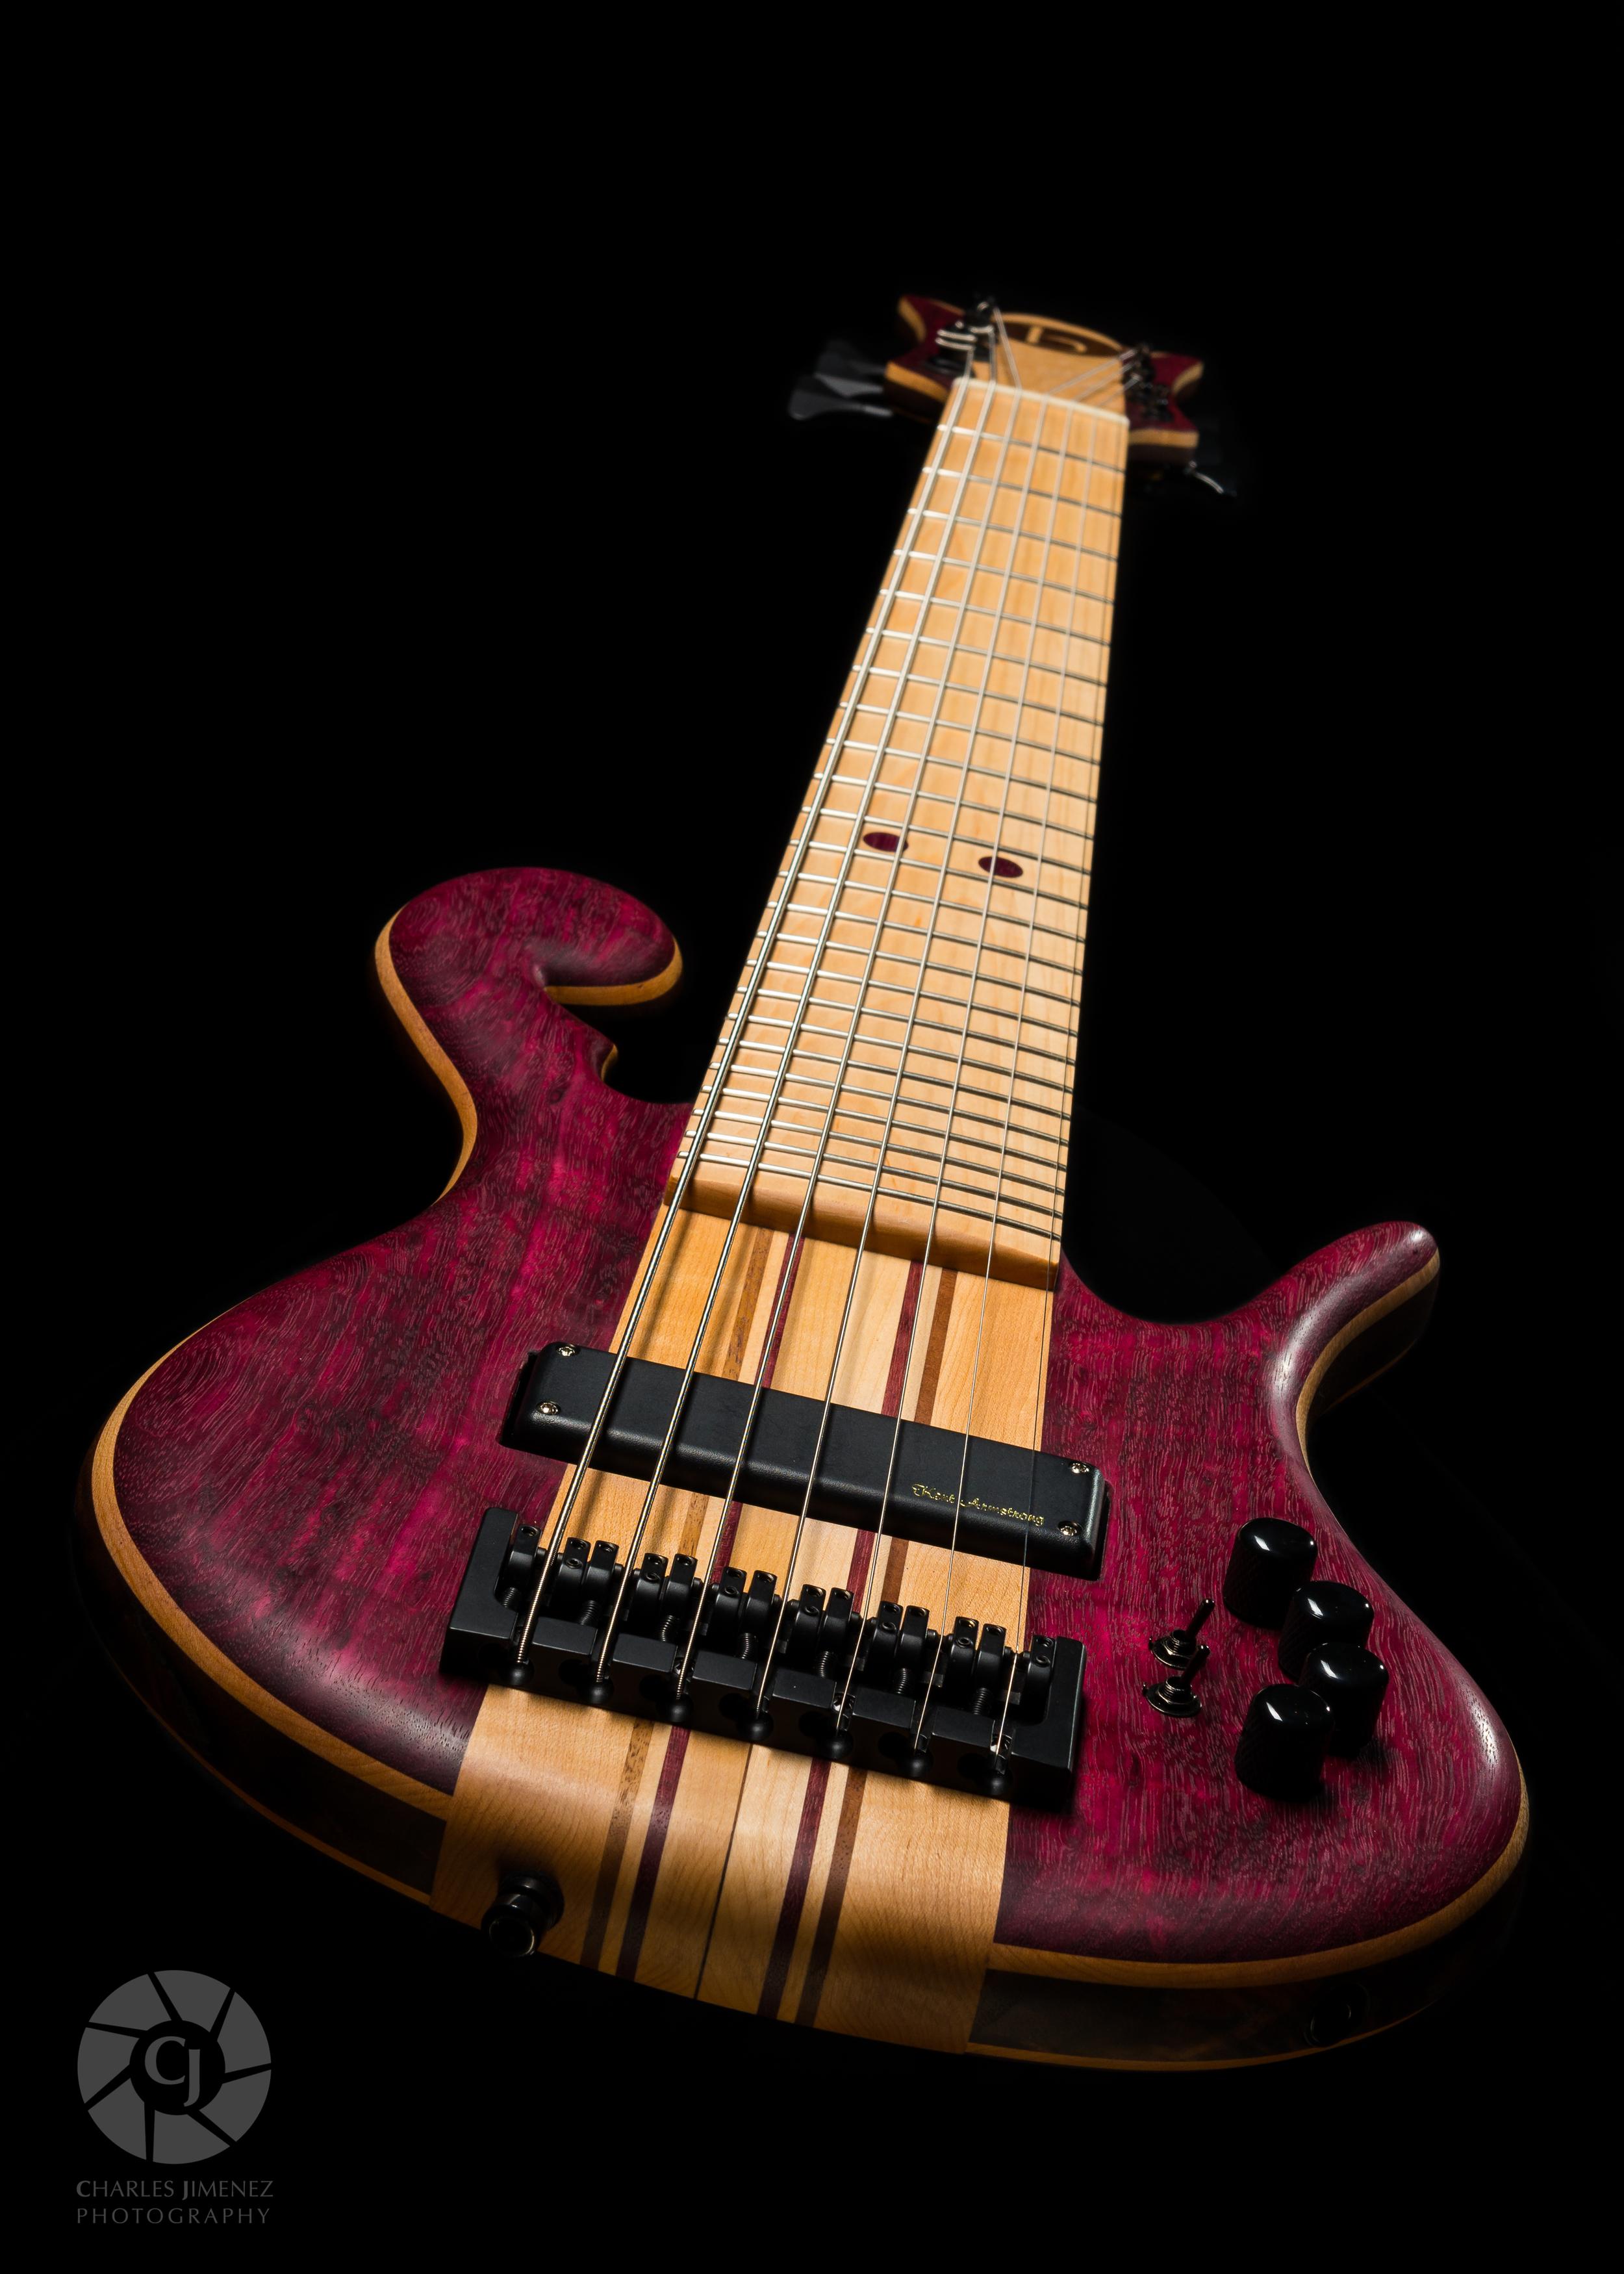 BMT Guitars_Grimace_January 04 2014_02.jpg